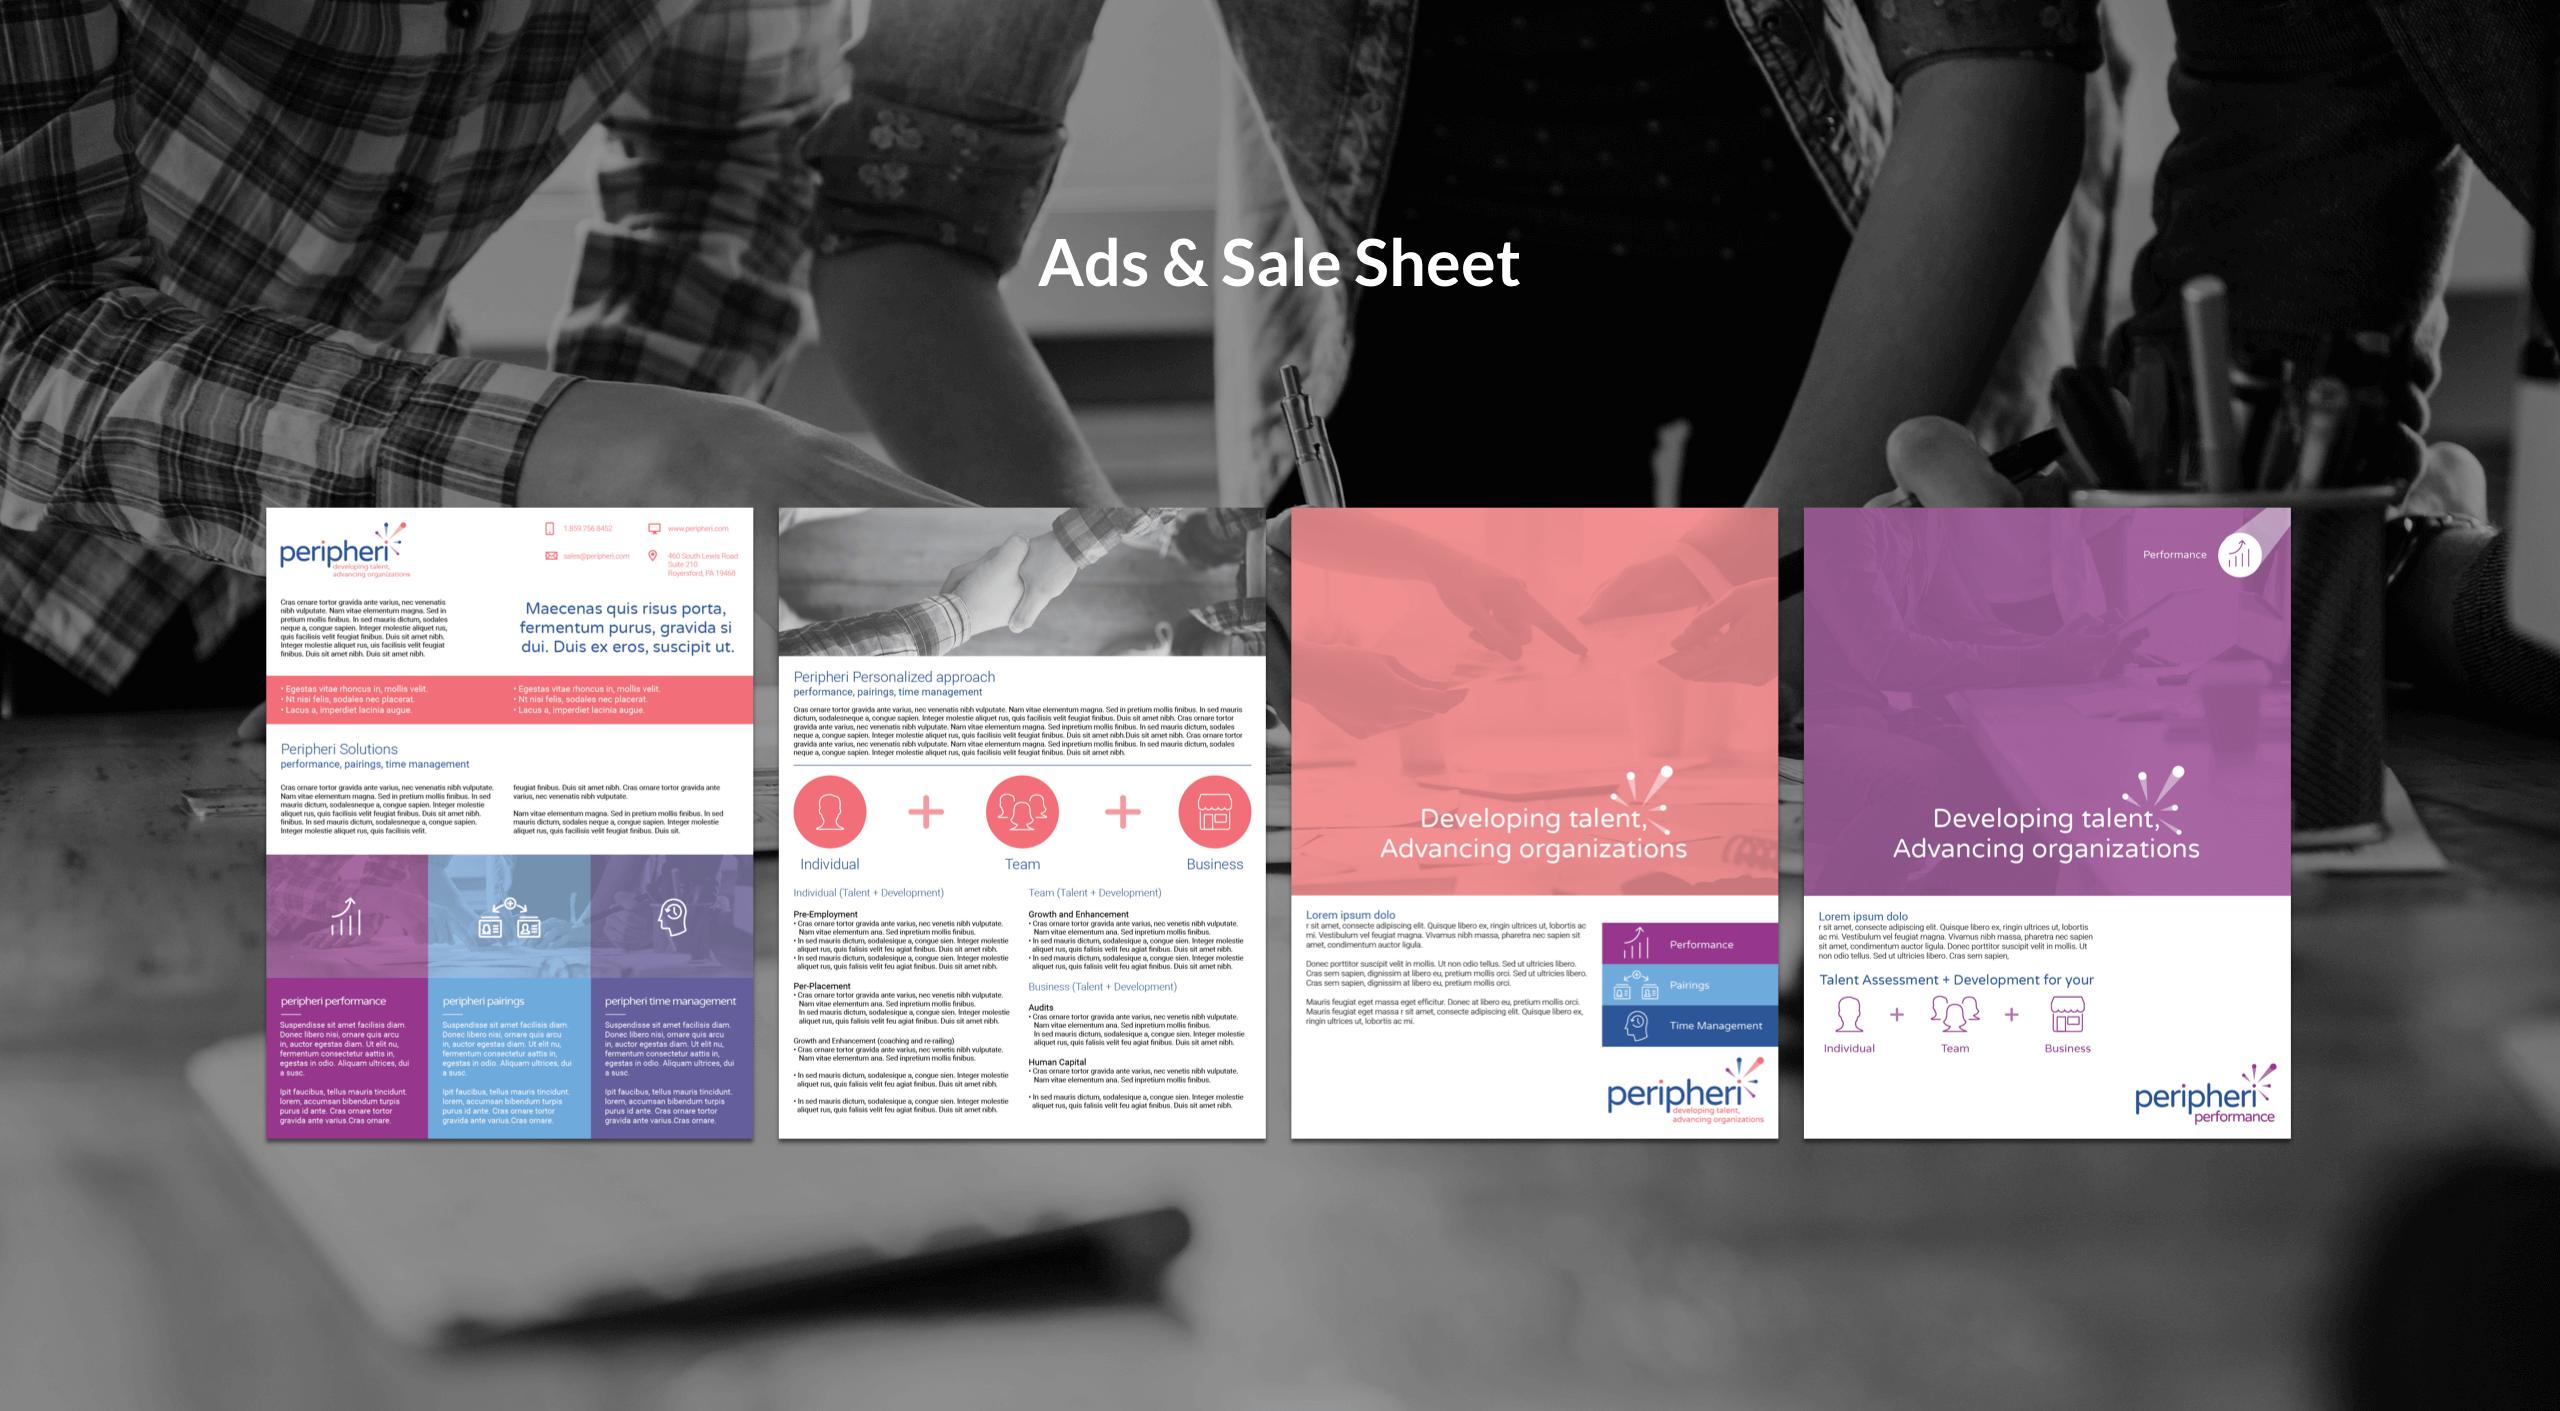 ads&salesheet_peripheri